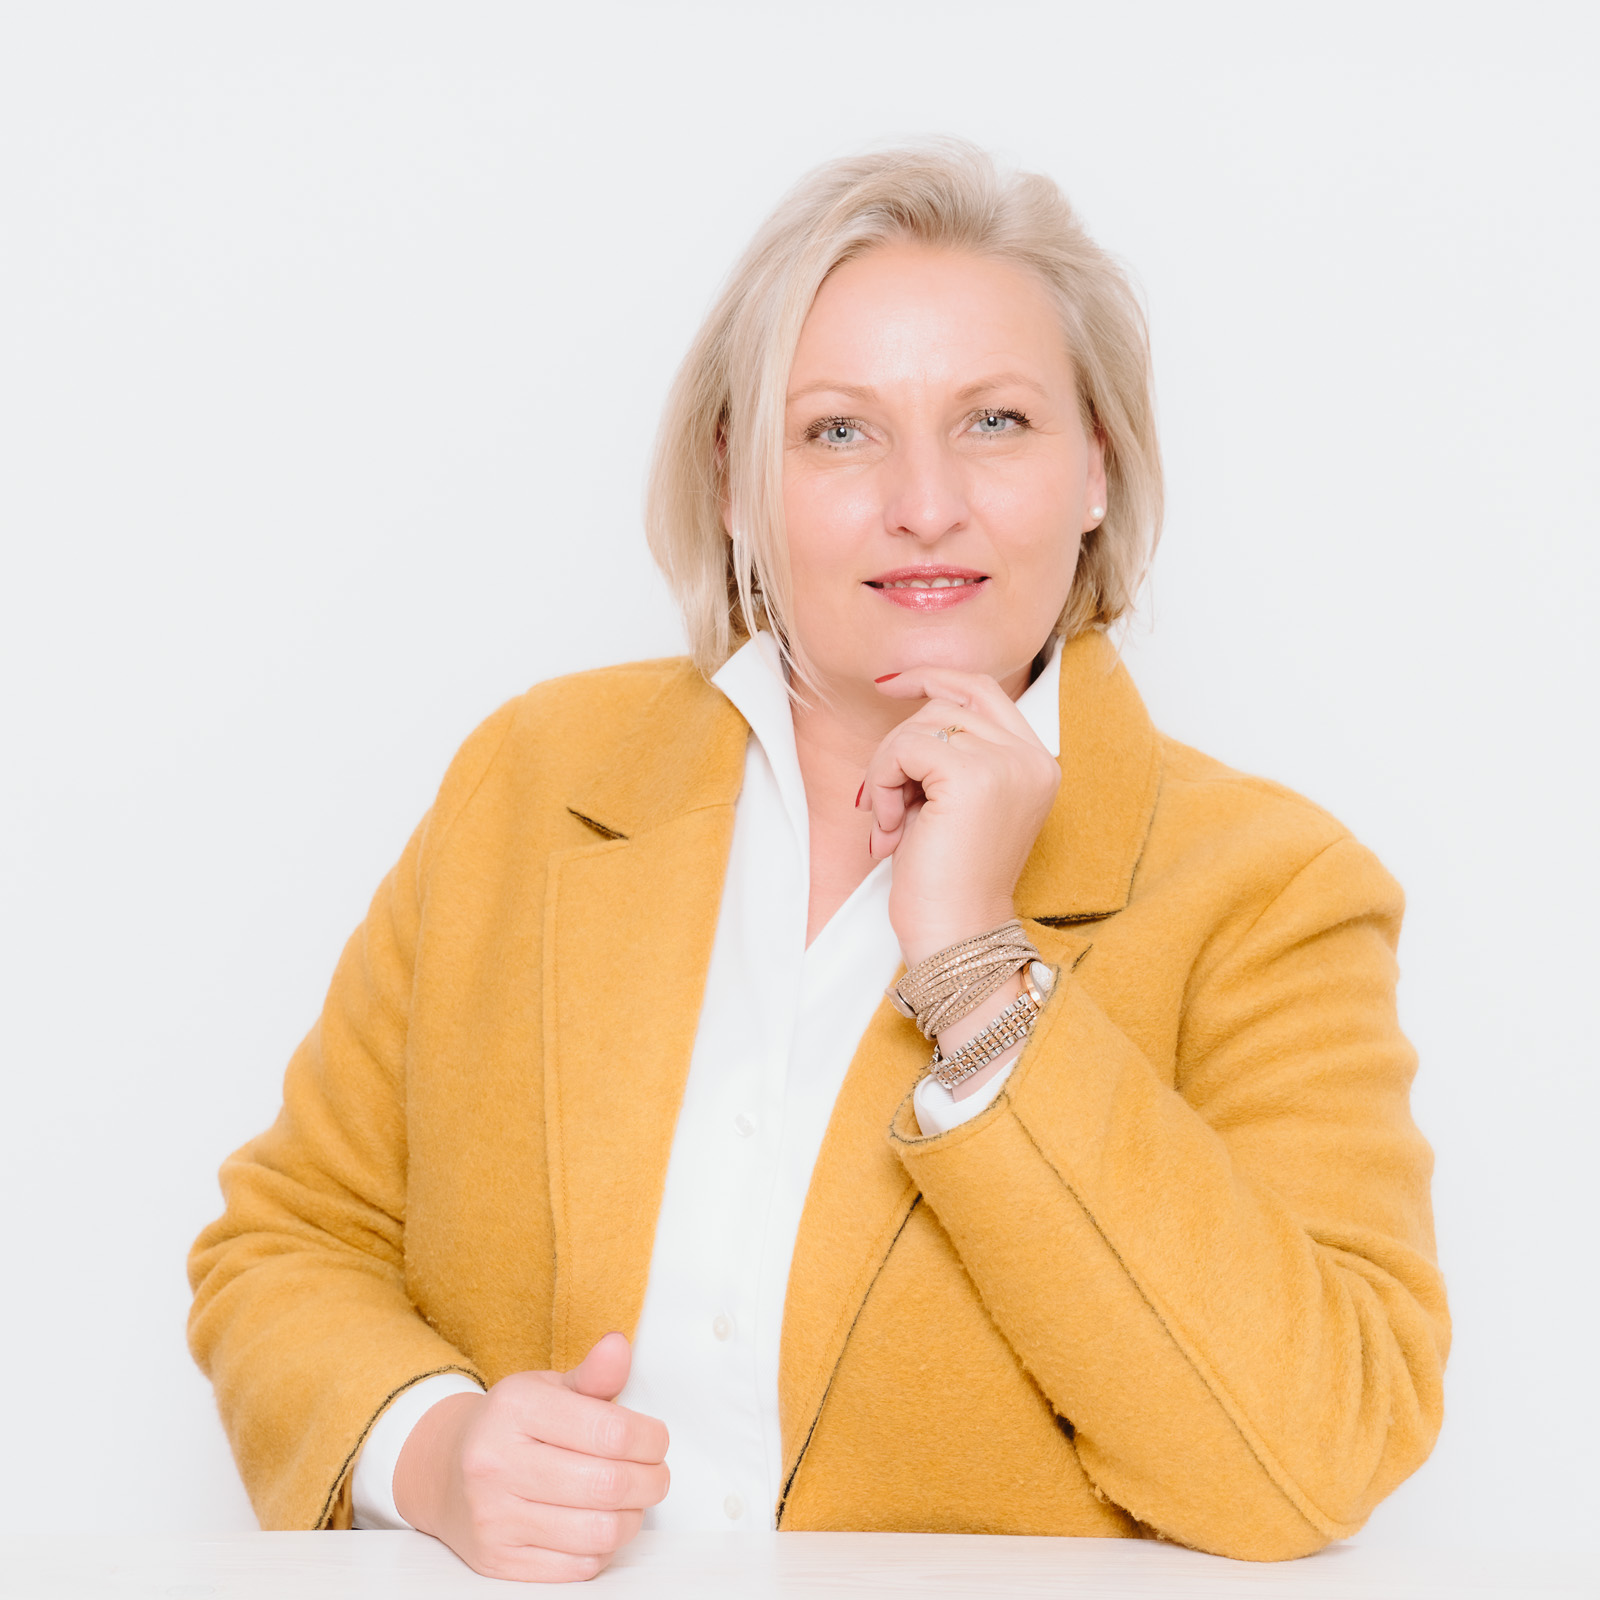 Businessporträts - Logopädin Kerstin Winterboer im Shooting